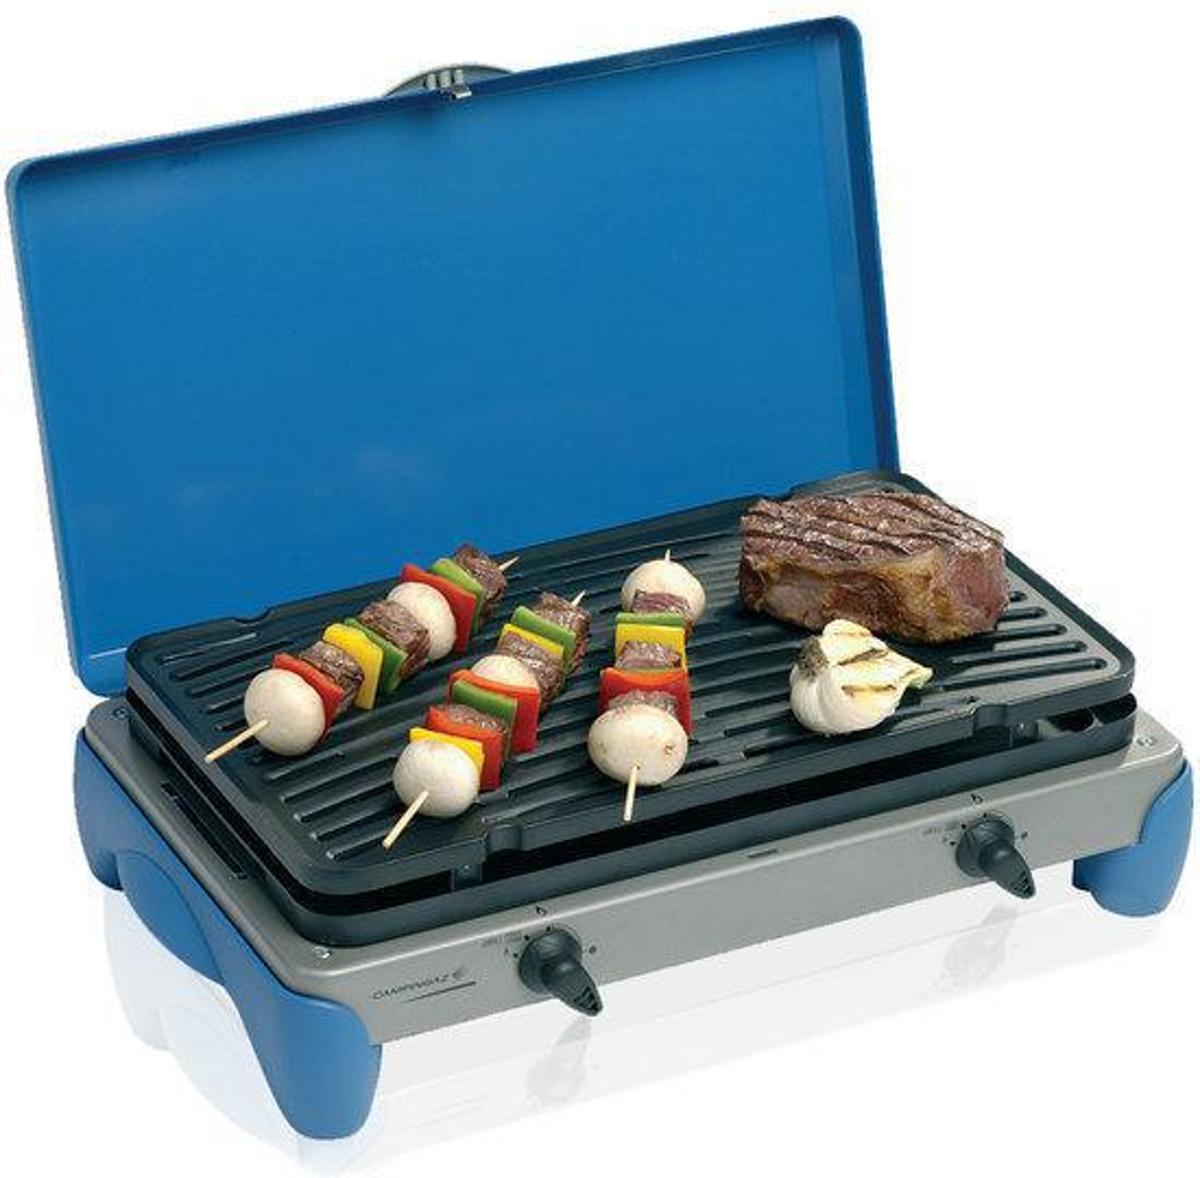 bol.com   Campingaz camping kitchen grill stove